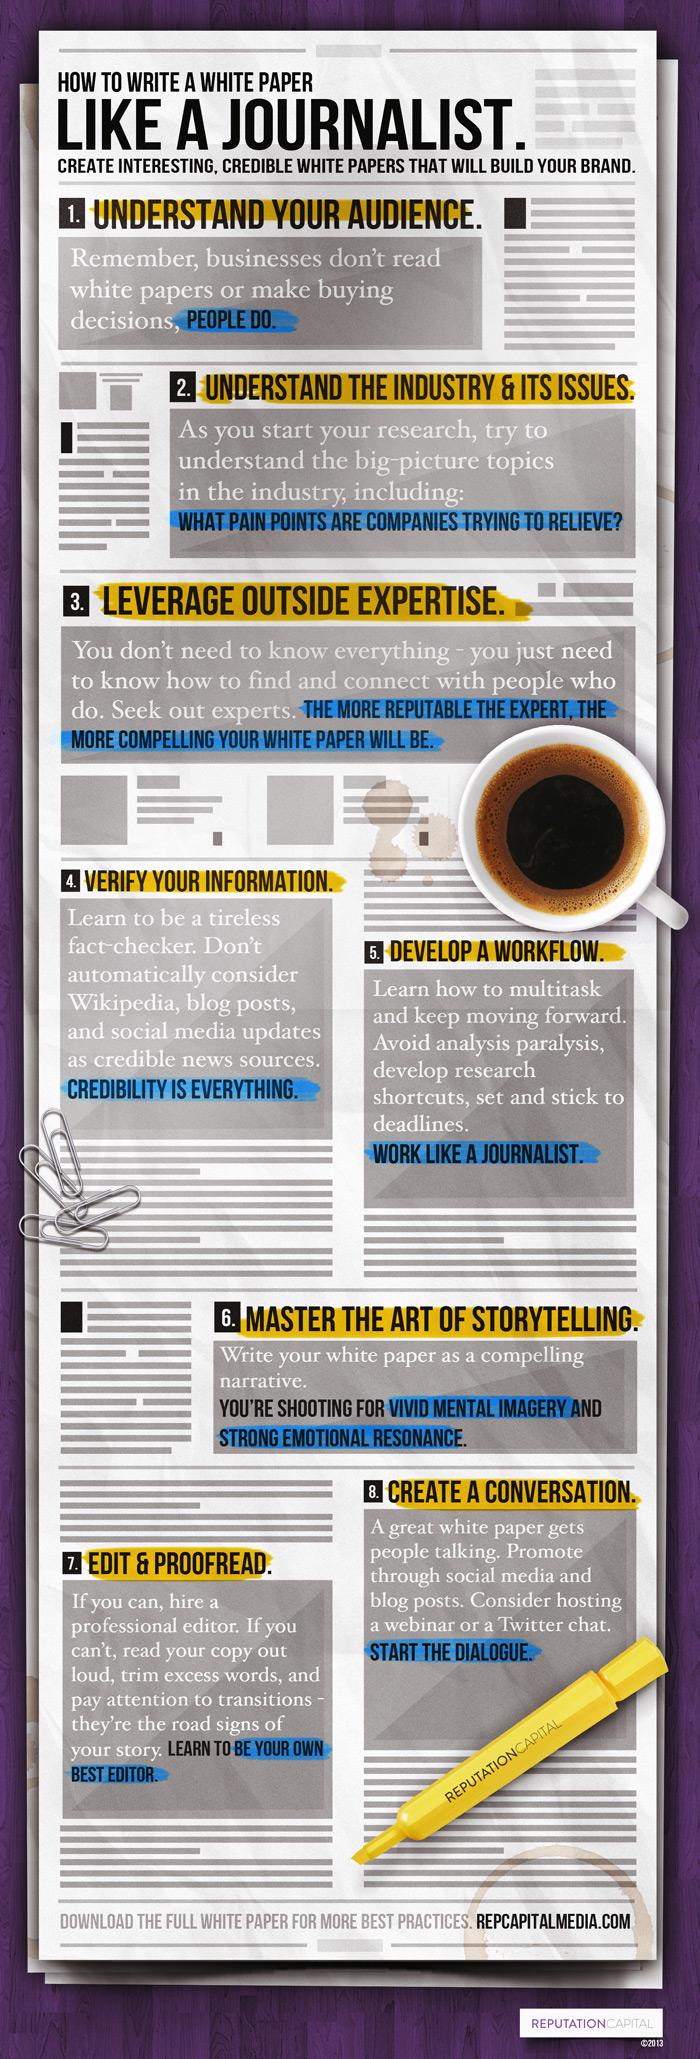 How-to-Write-Like-a-Journalist